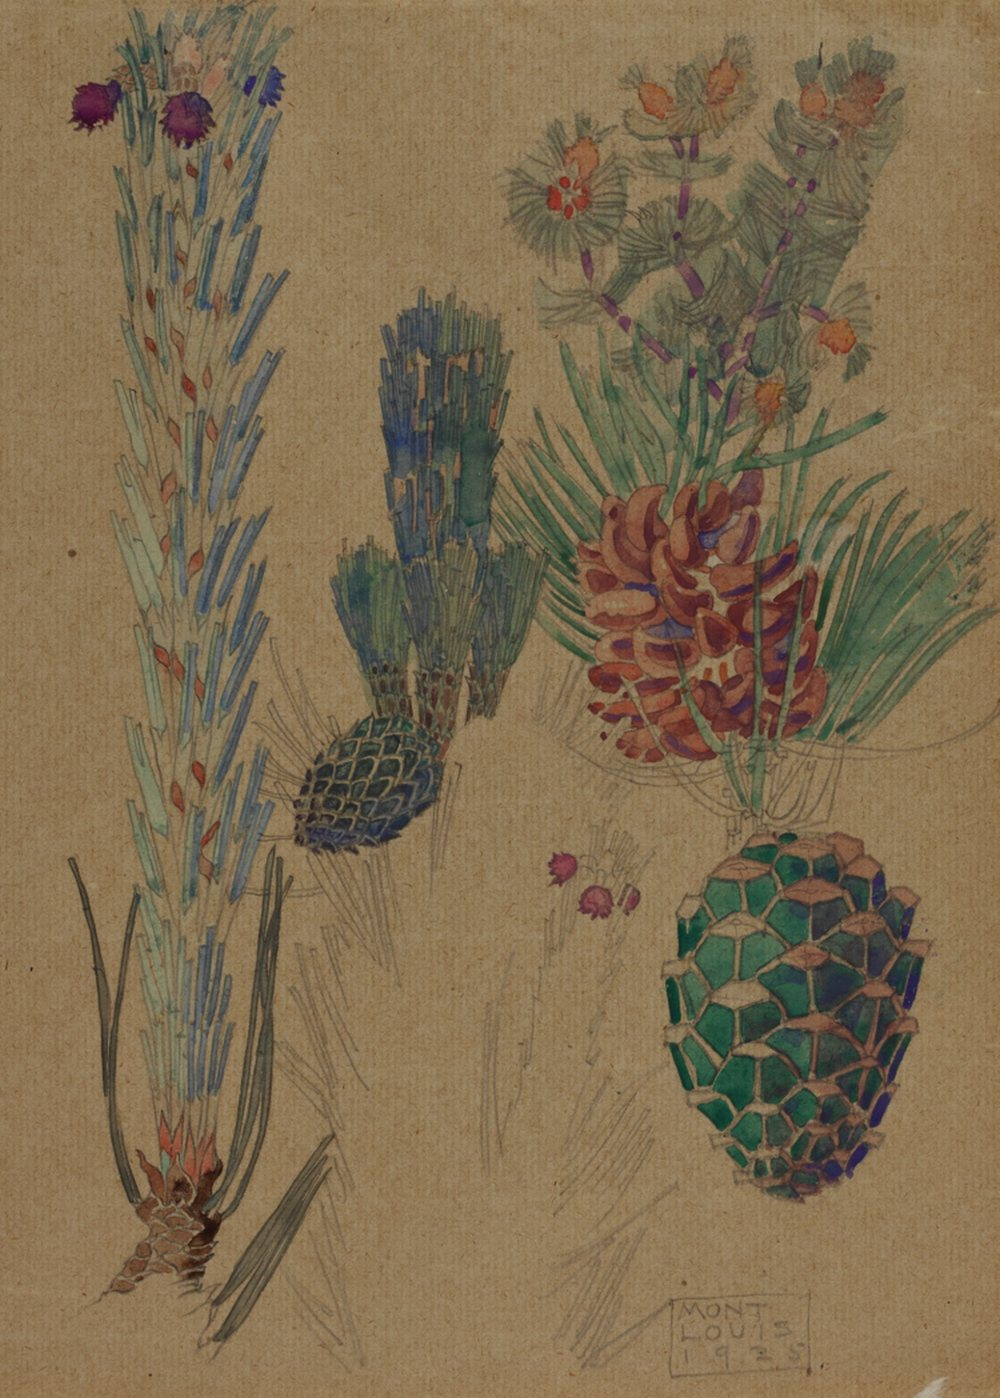 D Apres Nature Charles Rennie Mackintosh